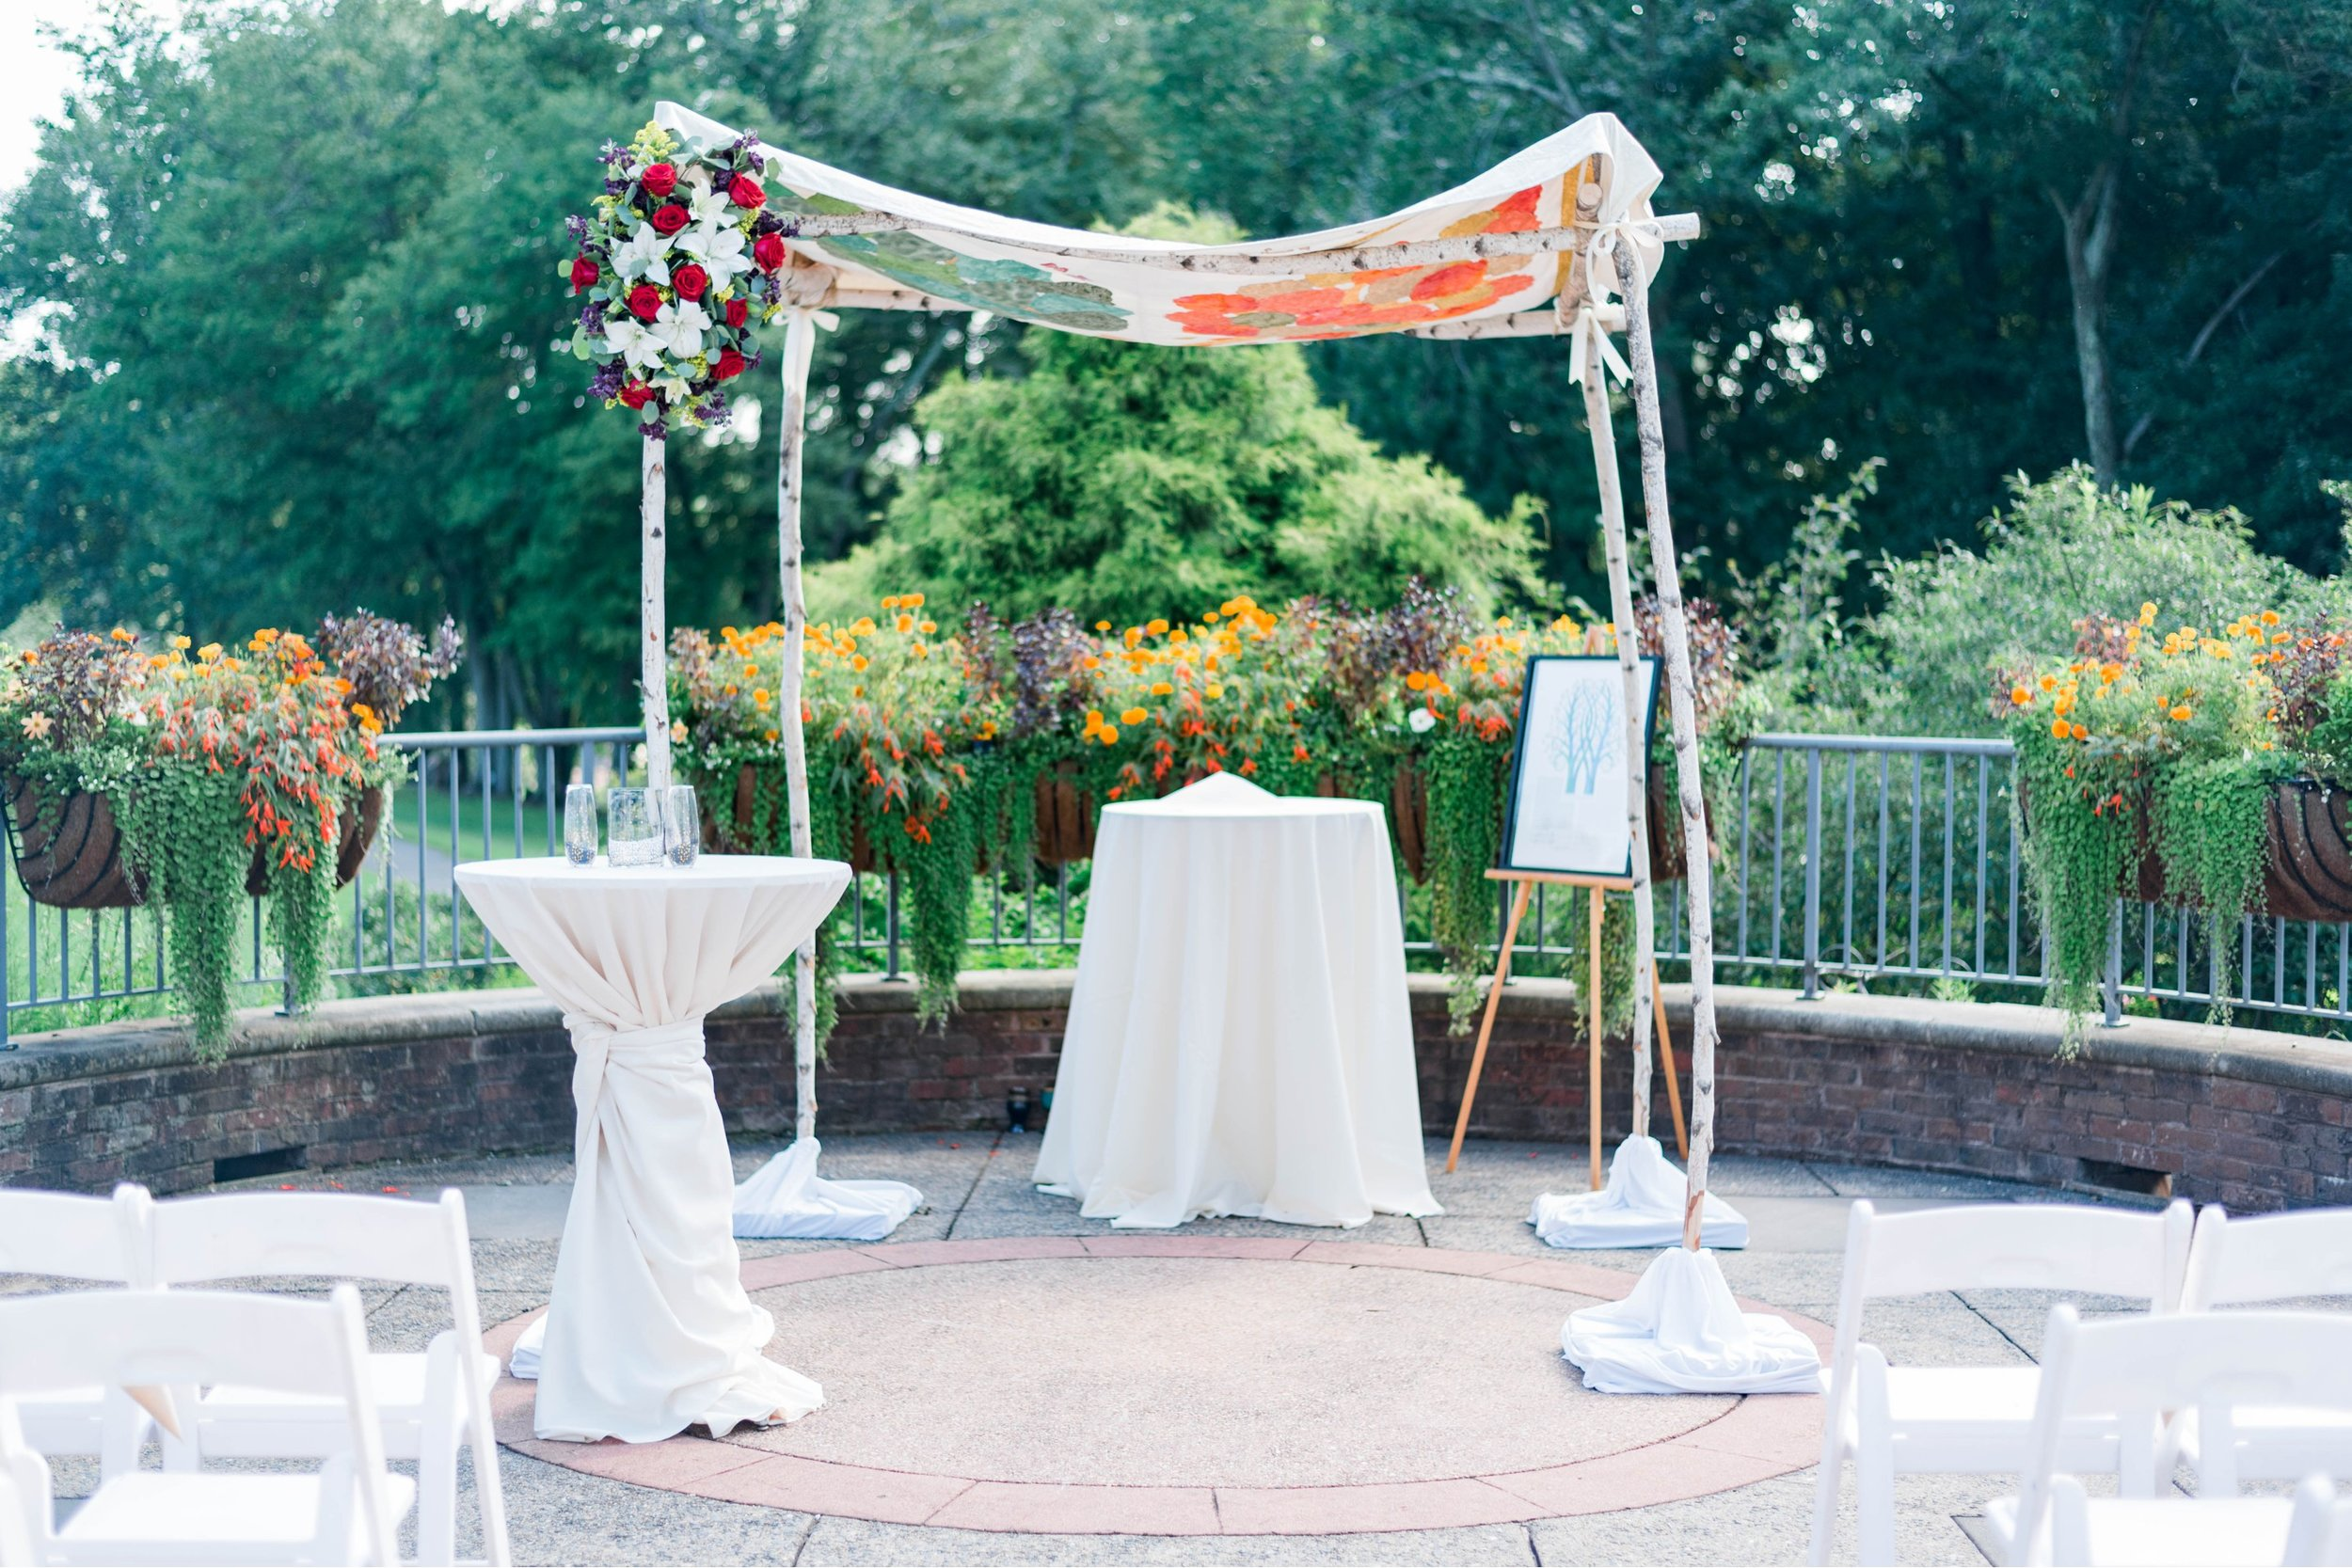 TheAtriumatMeadowlark_Virginiawedding photographer_lynchburgweddingphotographer_DCweddingPhotographer_KristinAaron 15.jpg